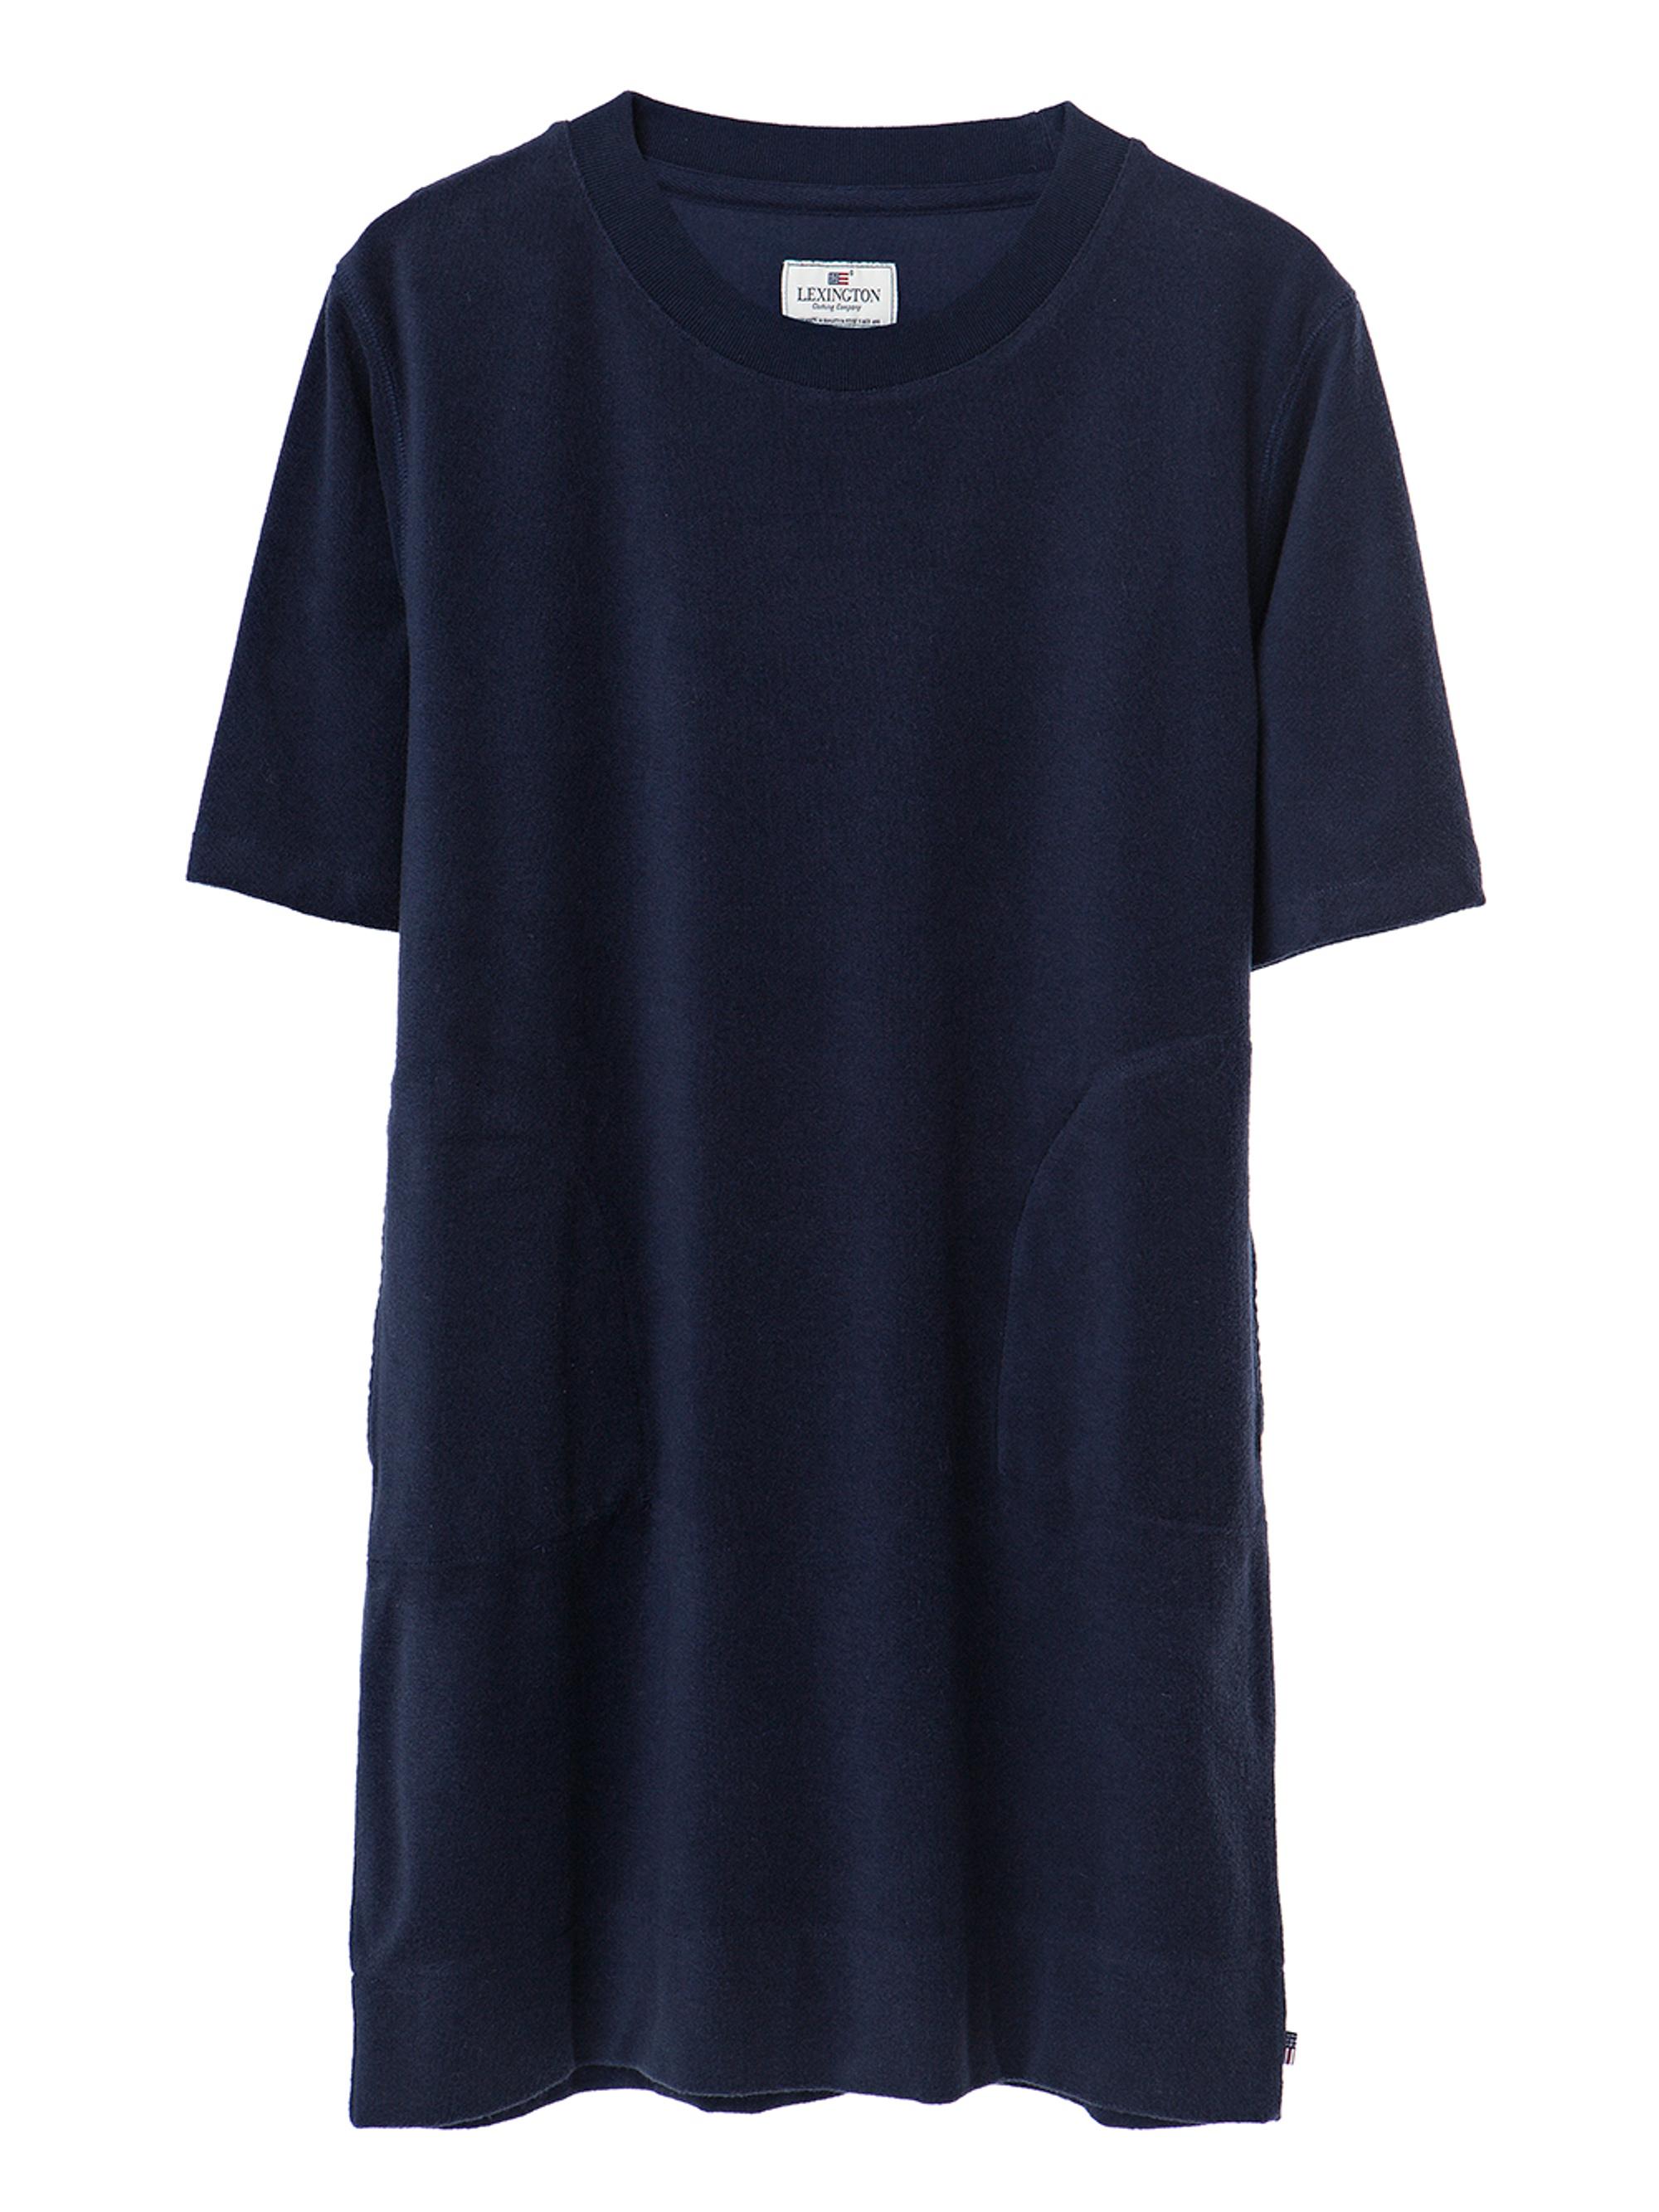 Cory Terry Dress, Deep Marine Blue